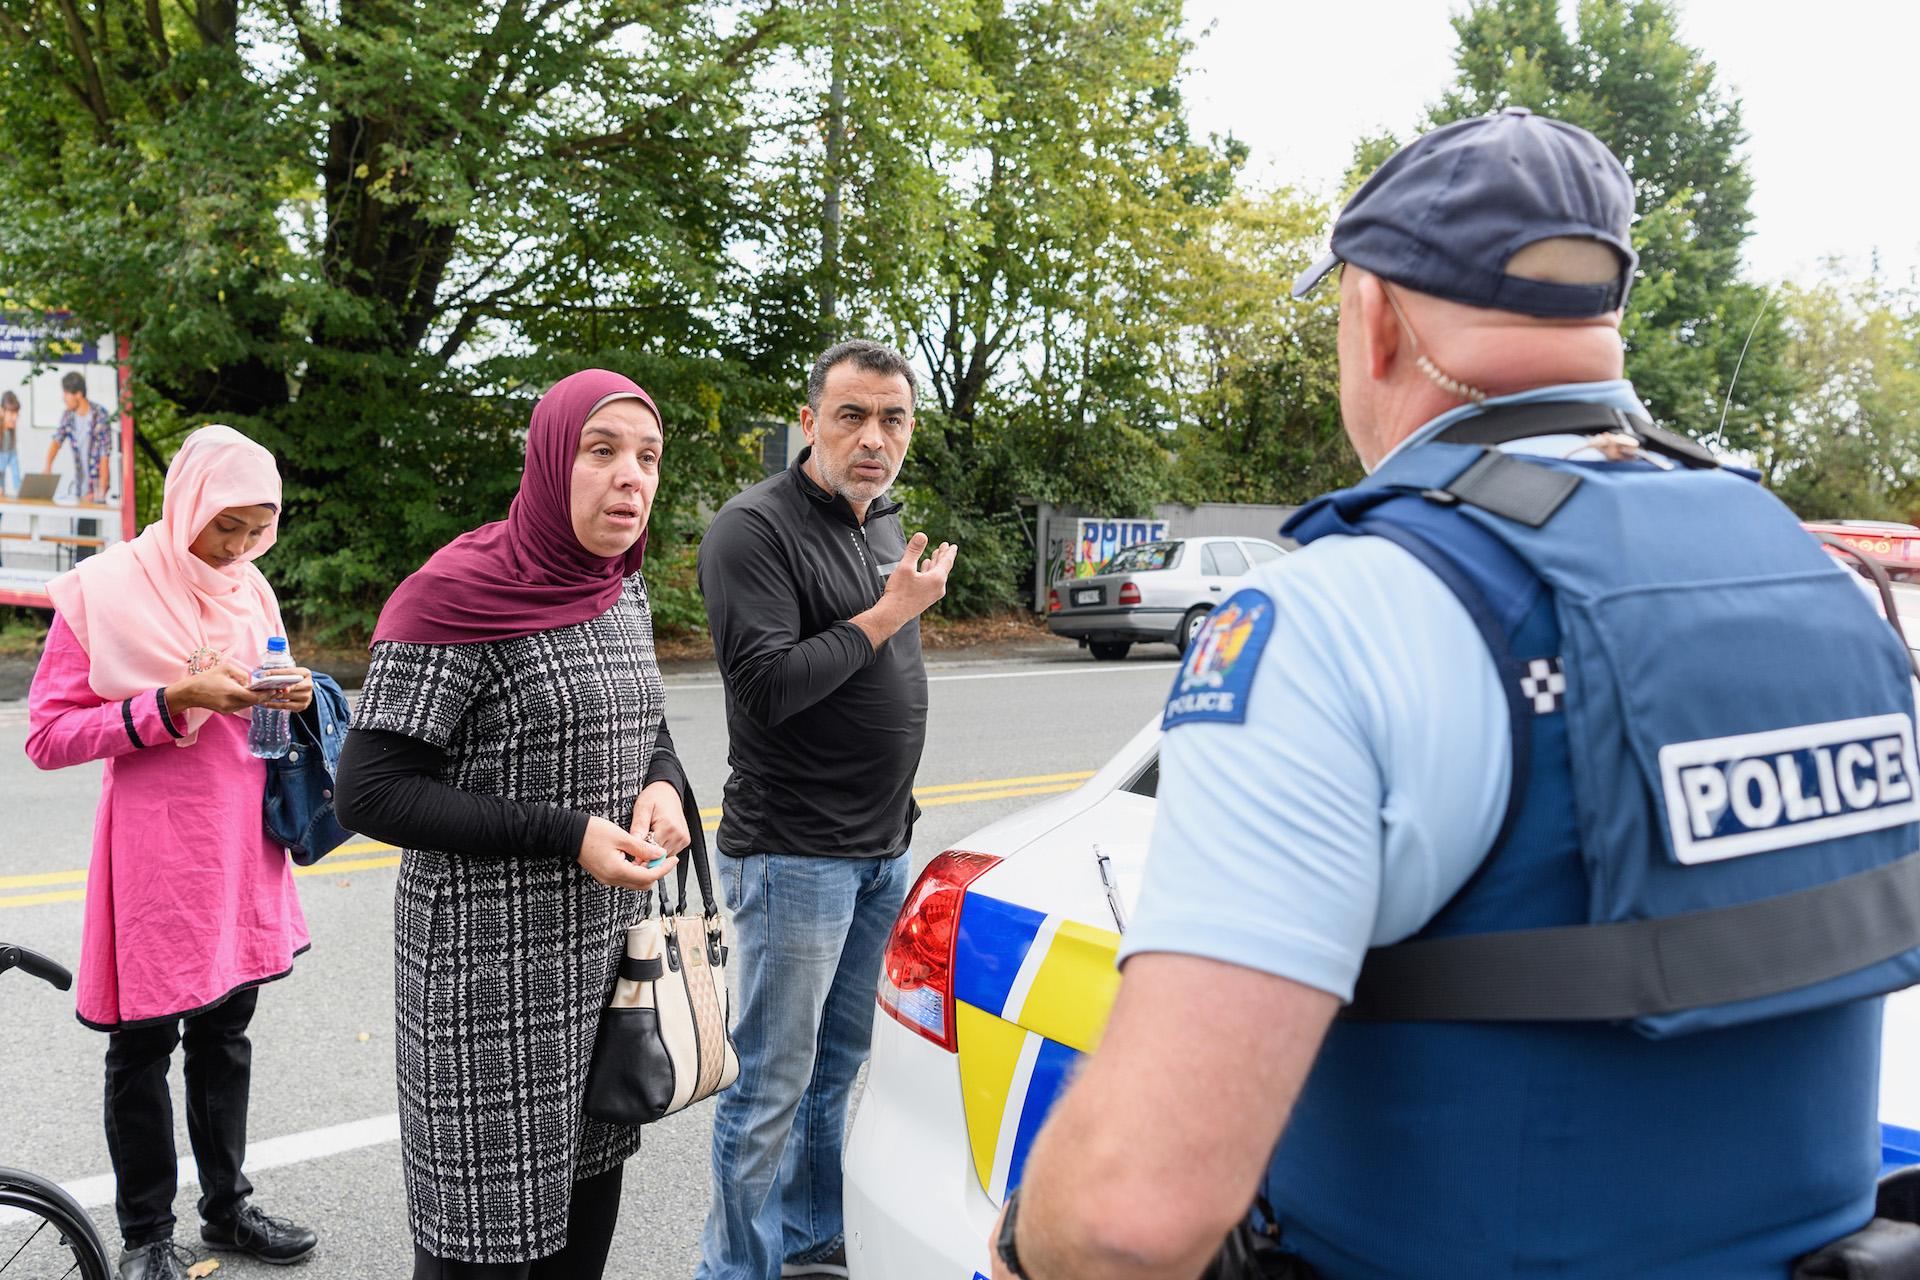 Christchurch Shootings Twitter: Flipboard: Facebook, YouTube, Twitter Scramble To Remove